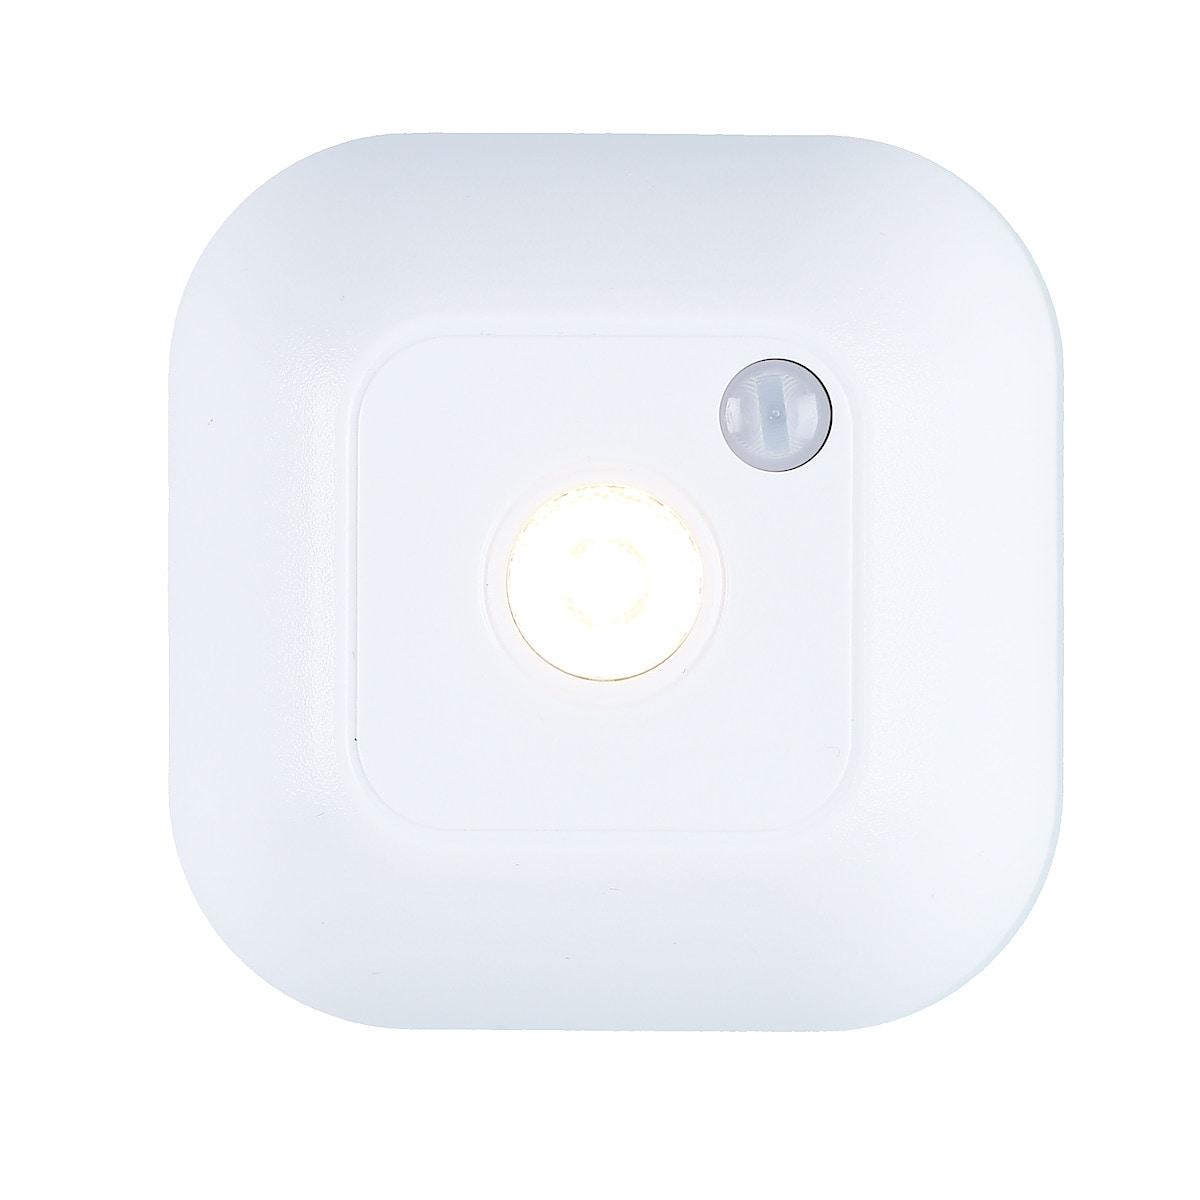 Ledvance Nightlux Ceiling LED belysning med sensor | Clas Ohlson